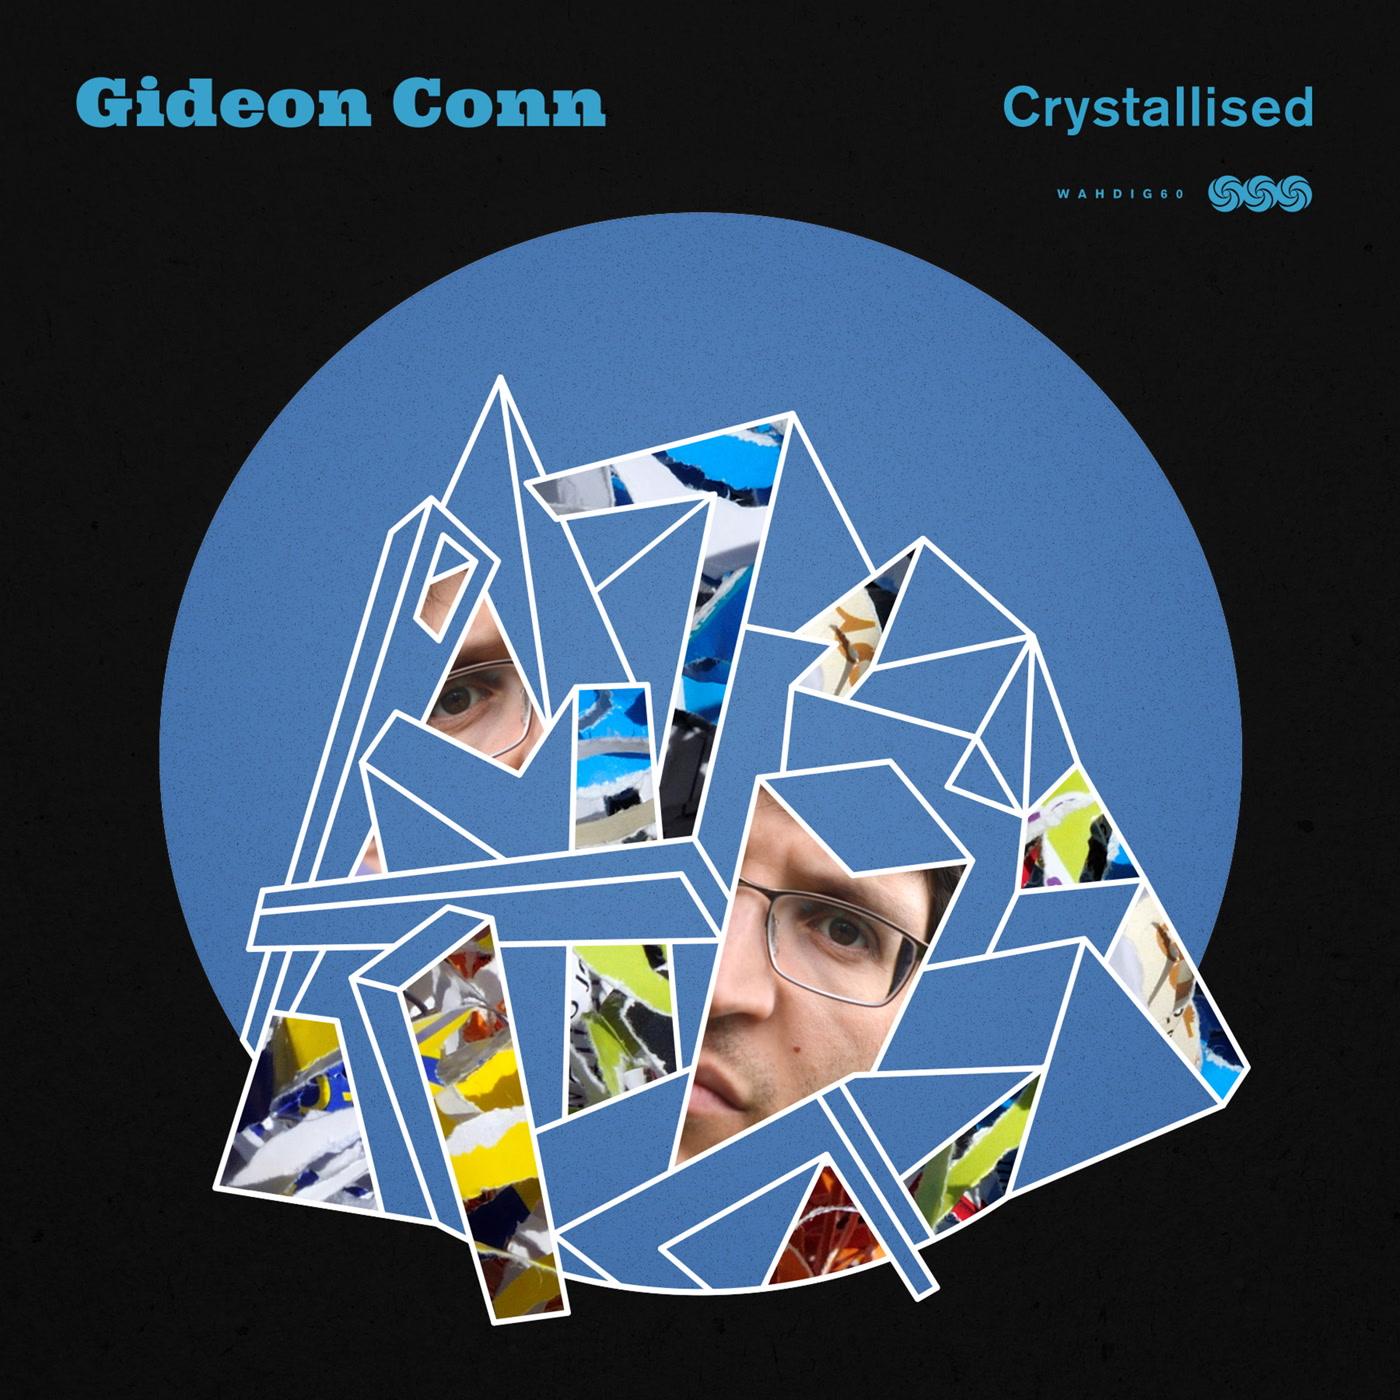 Gideon Conn Crystallised